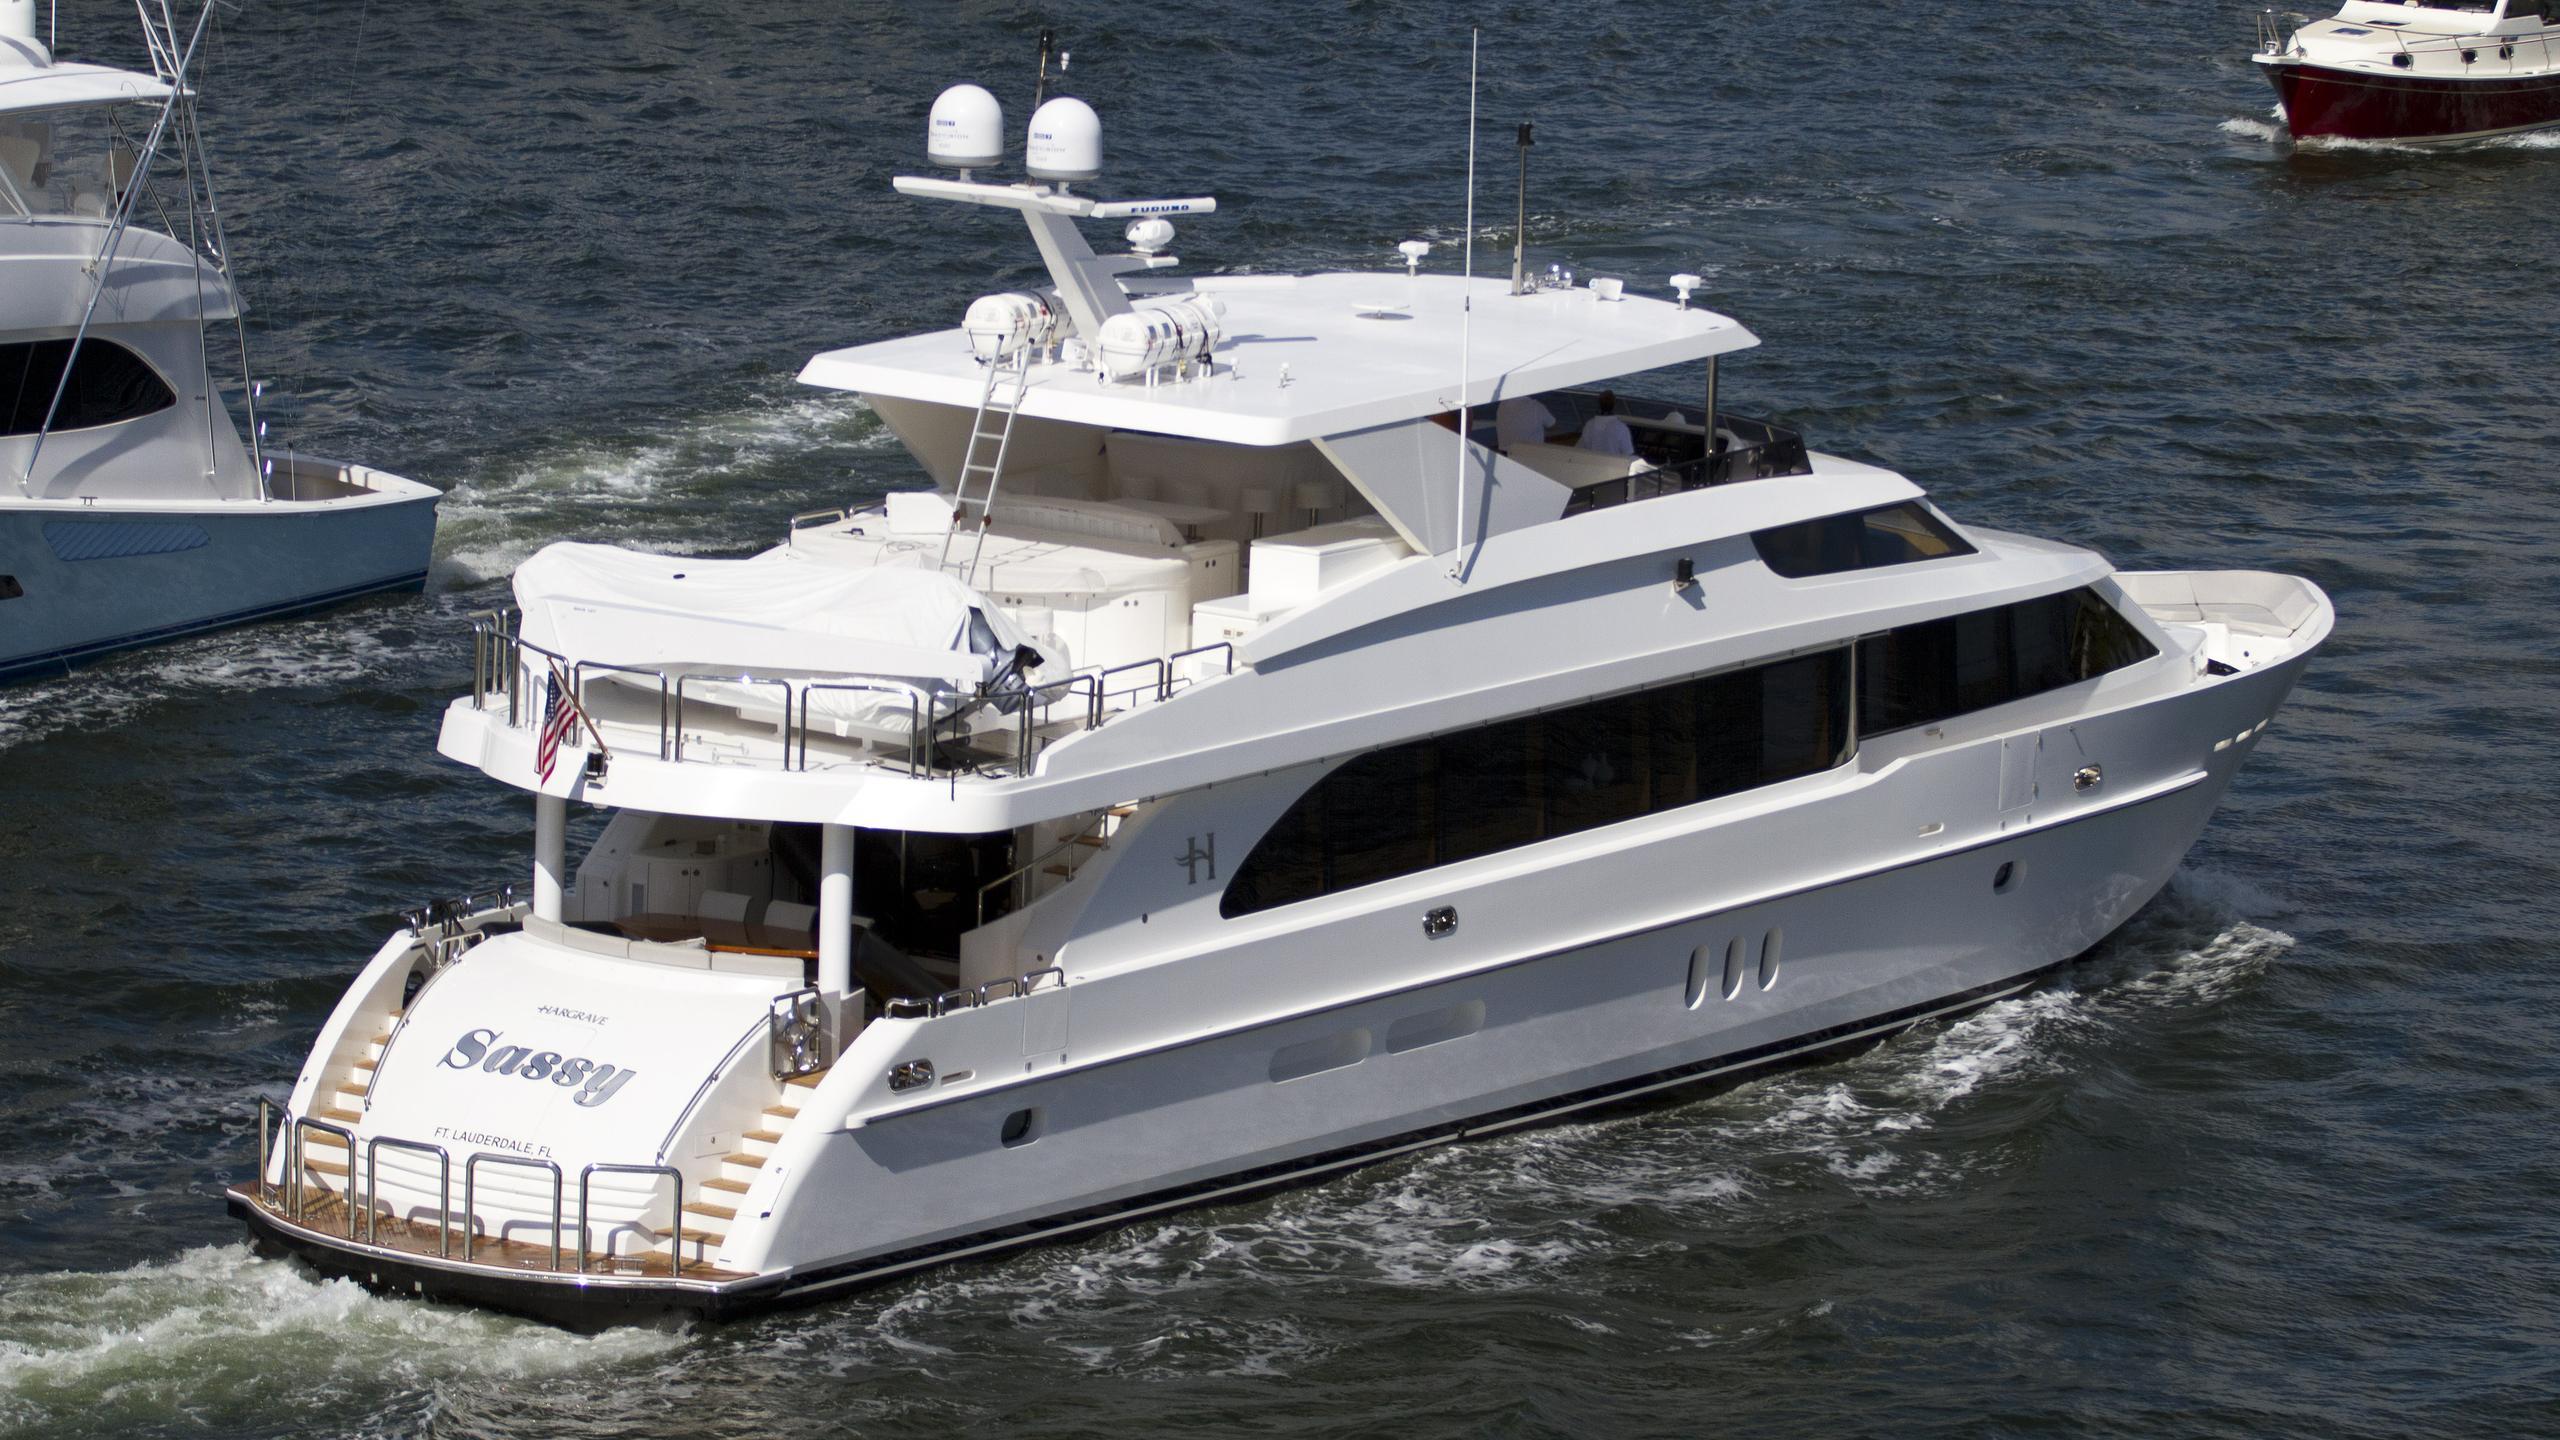 sassy-motoryacht-hargrave-101-2013-31m-stern-running